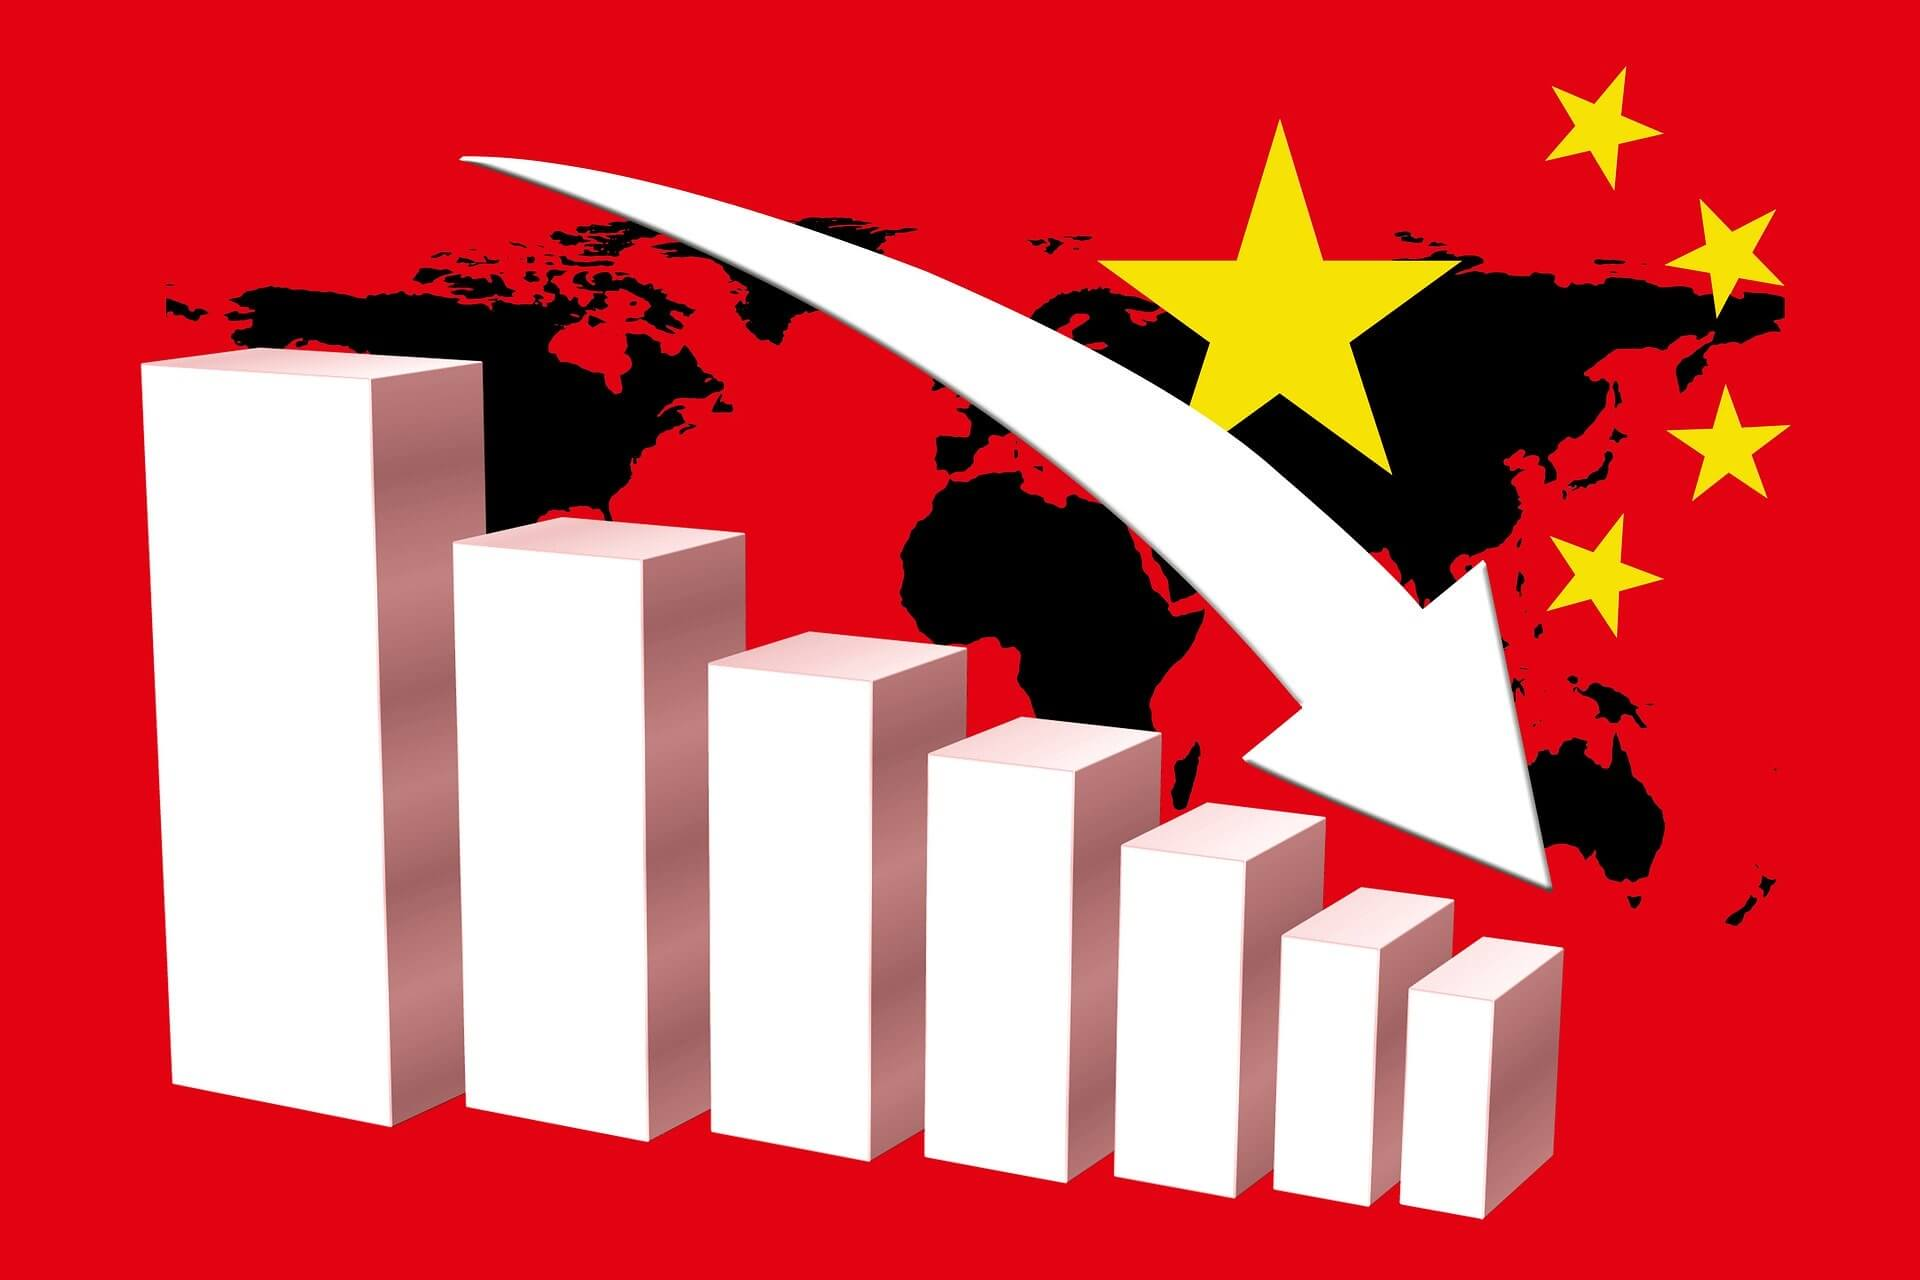 China production capacity decreases